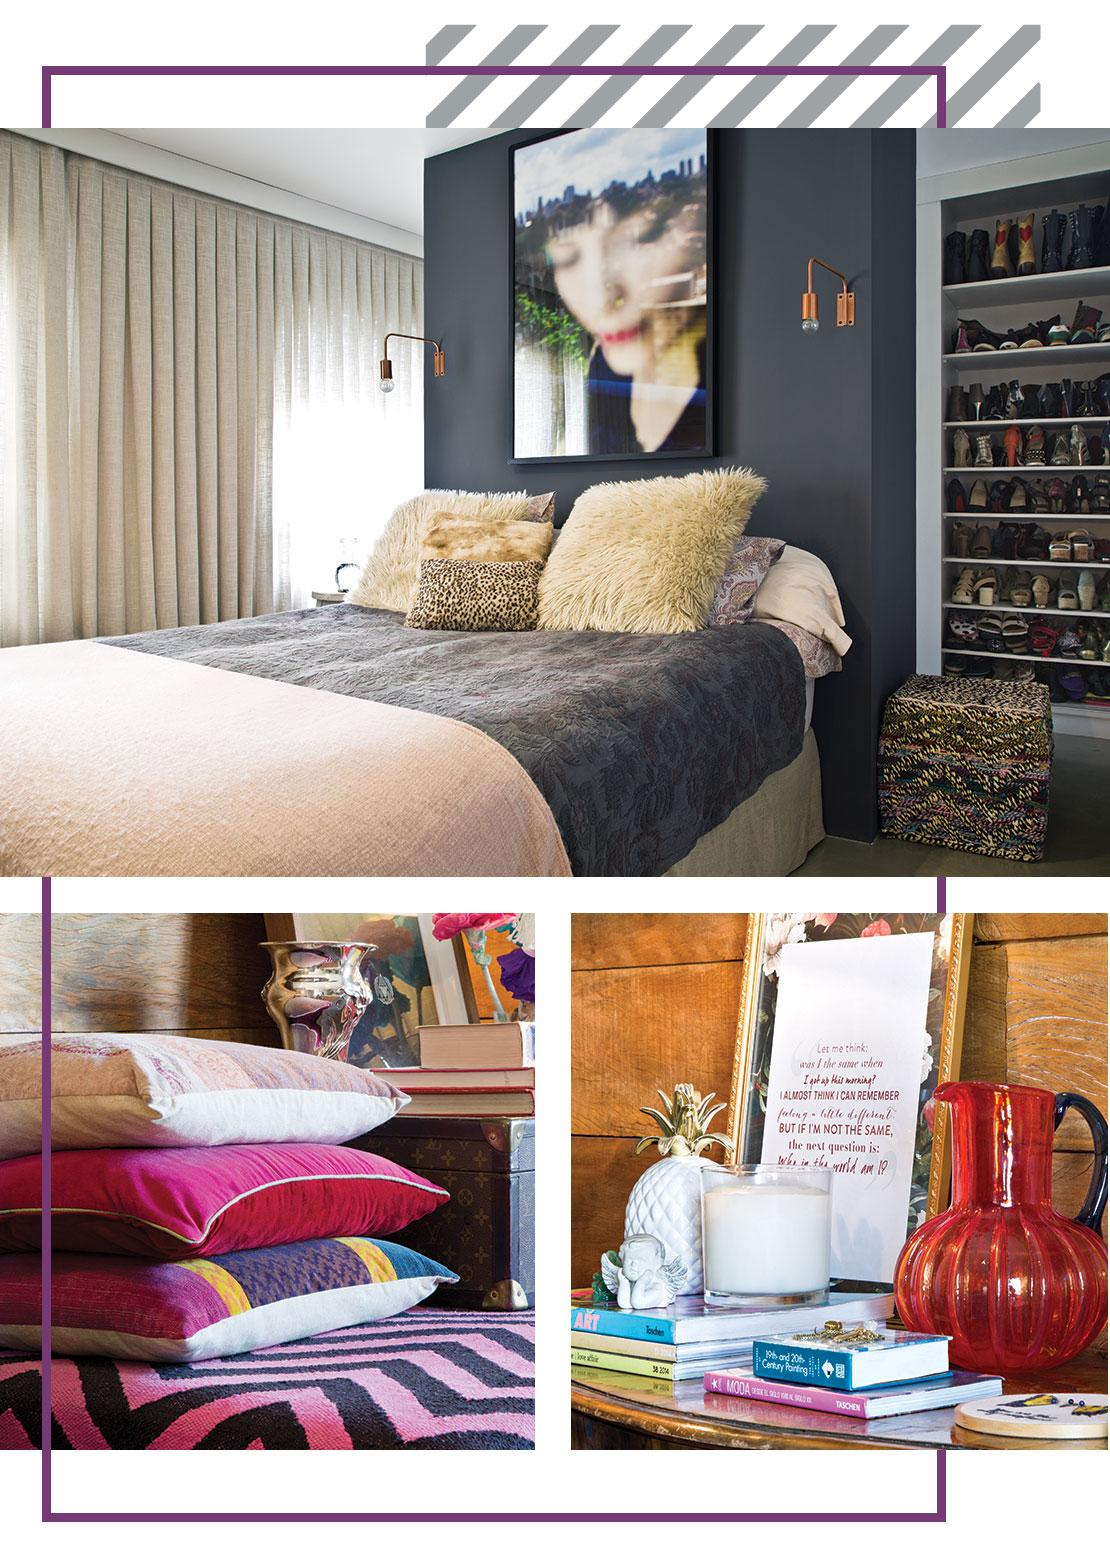 Ale-Tobler-Schlafzimmer-Westwing-Homestory